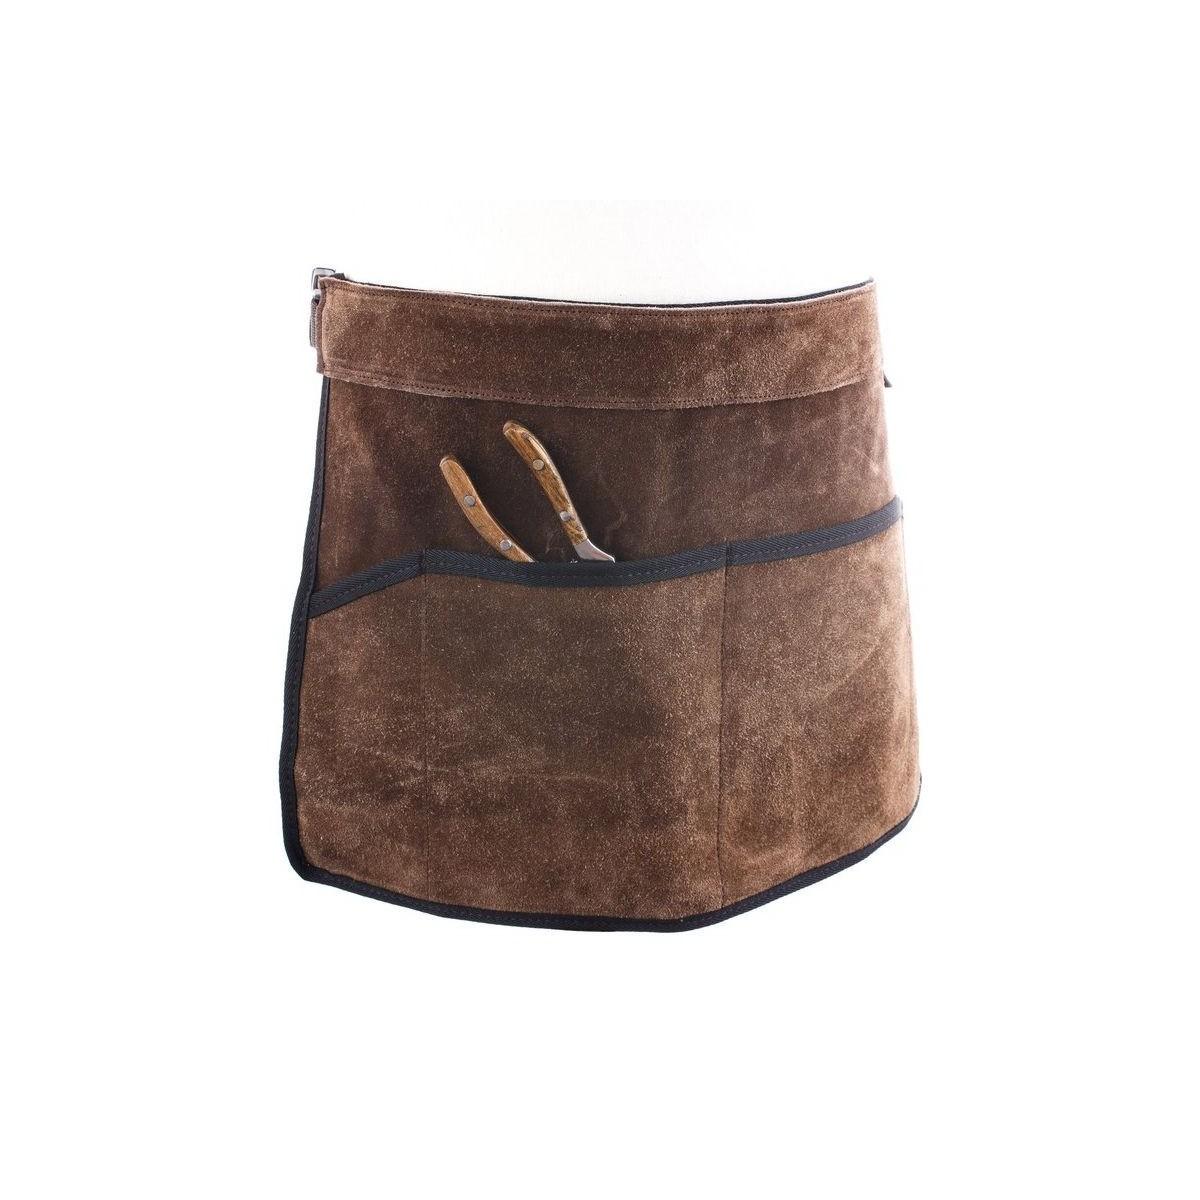 tablier ceinture porte outils en cuir daim botanique editions. Black Bedroom Furniture Sets. Home Design Ideas